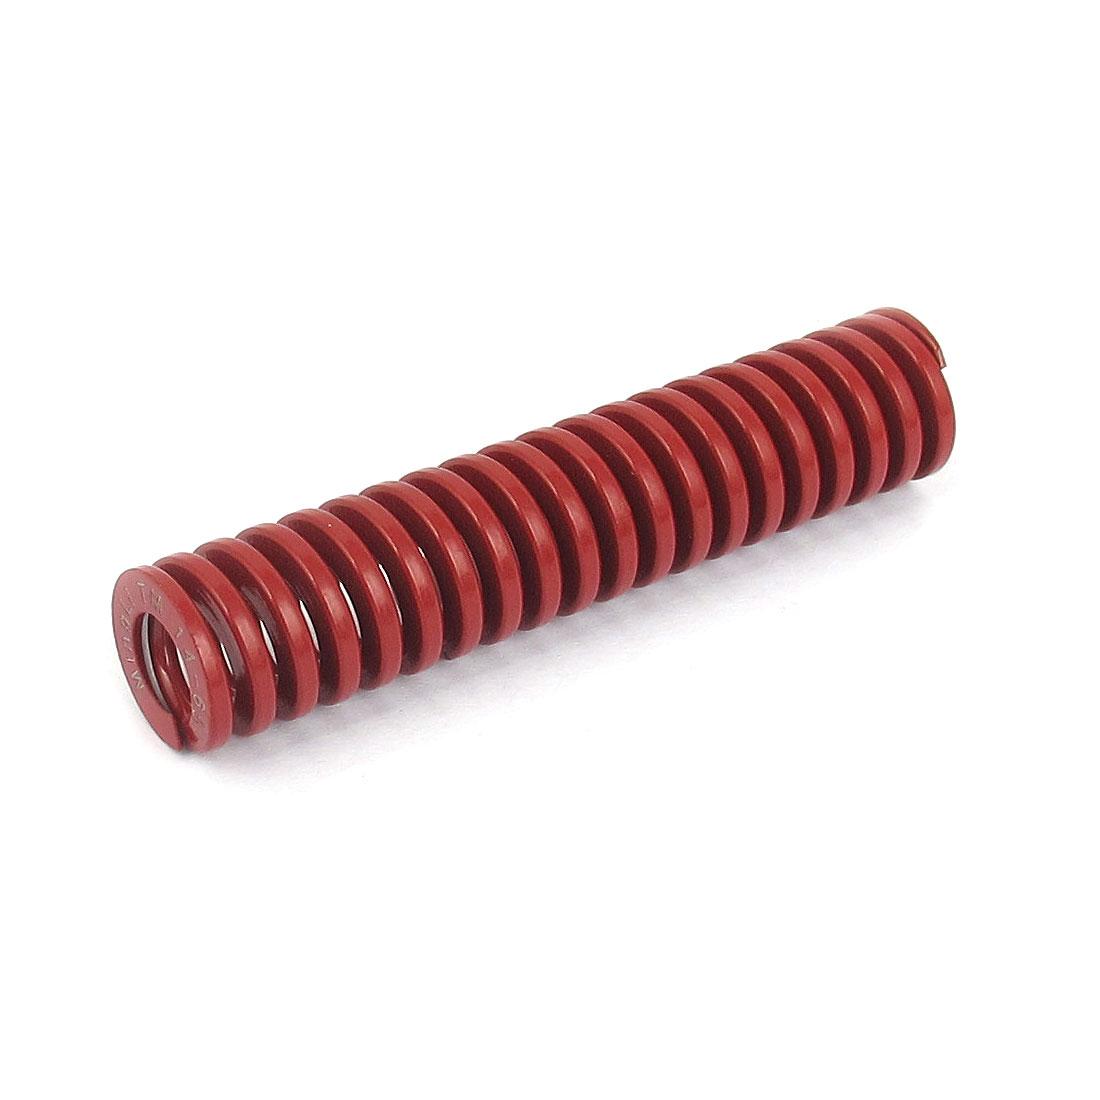 14mm OD 65mm Long Medium Load Spiral Stamping Compression Die Spring Red